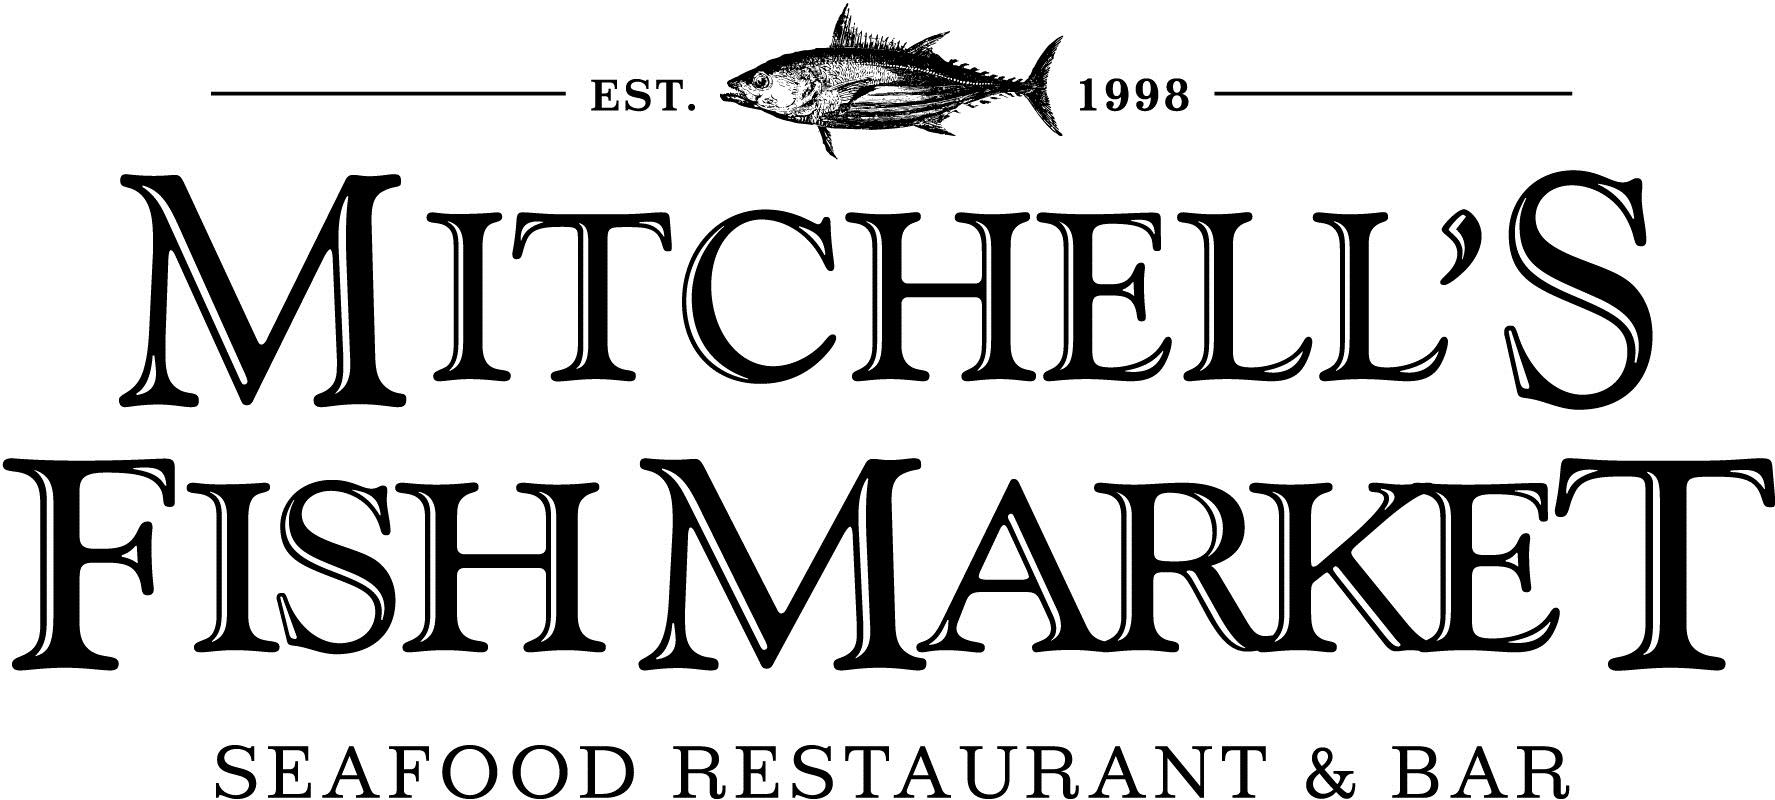 Mitchell s fish market to host taste of california wine for Mitchell s fish market menu